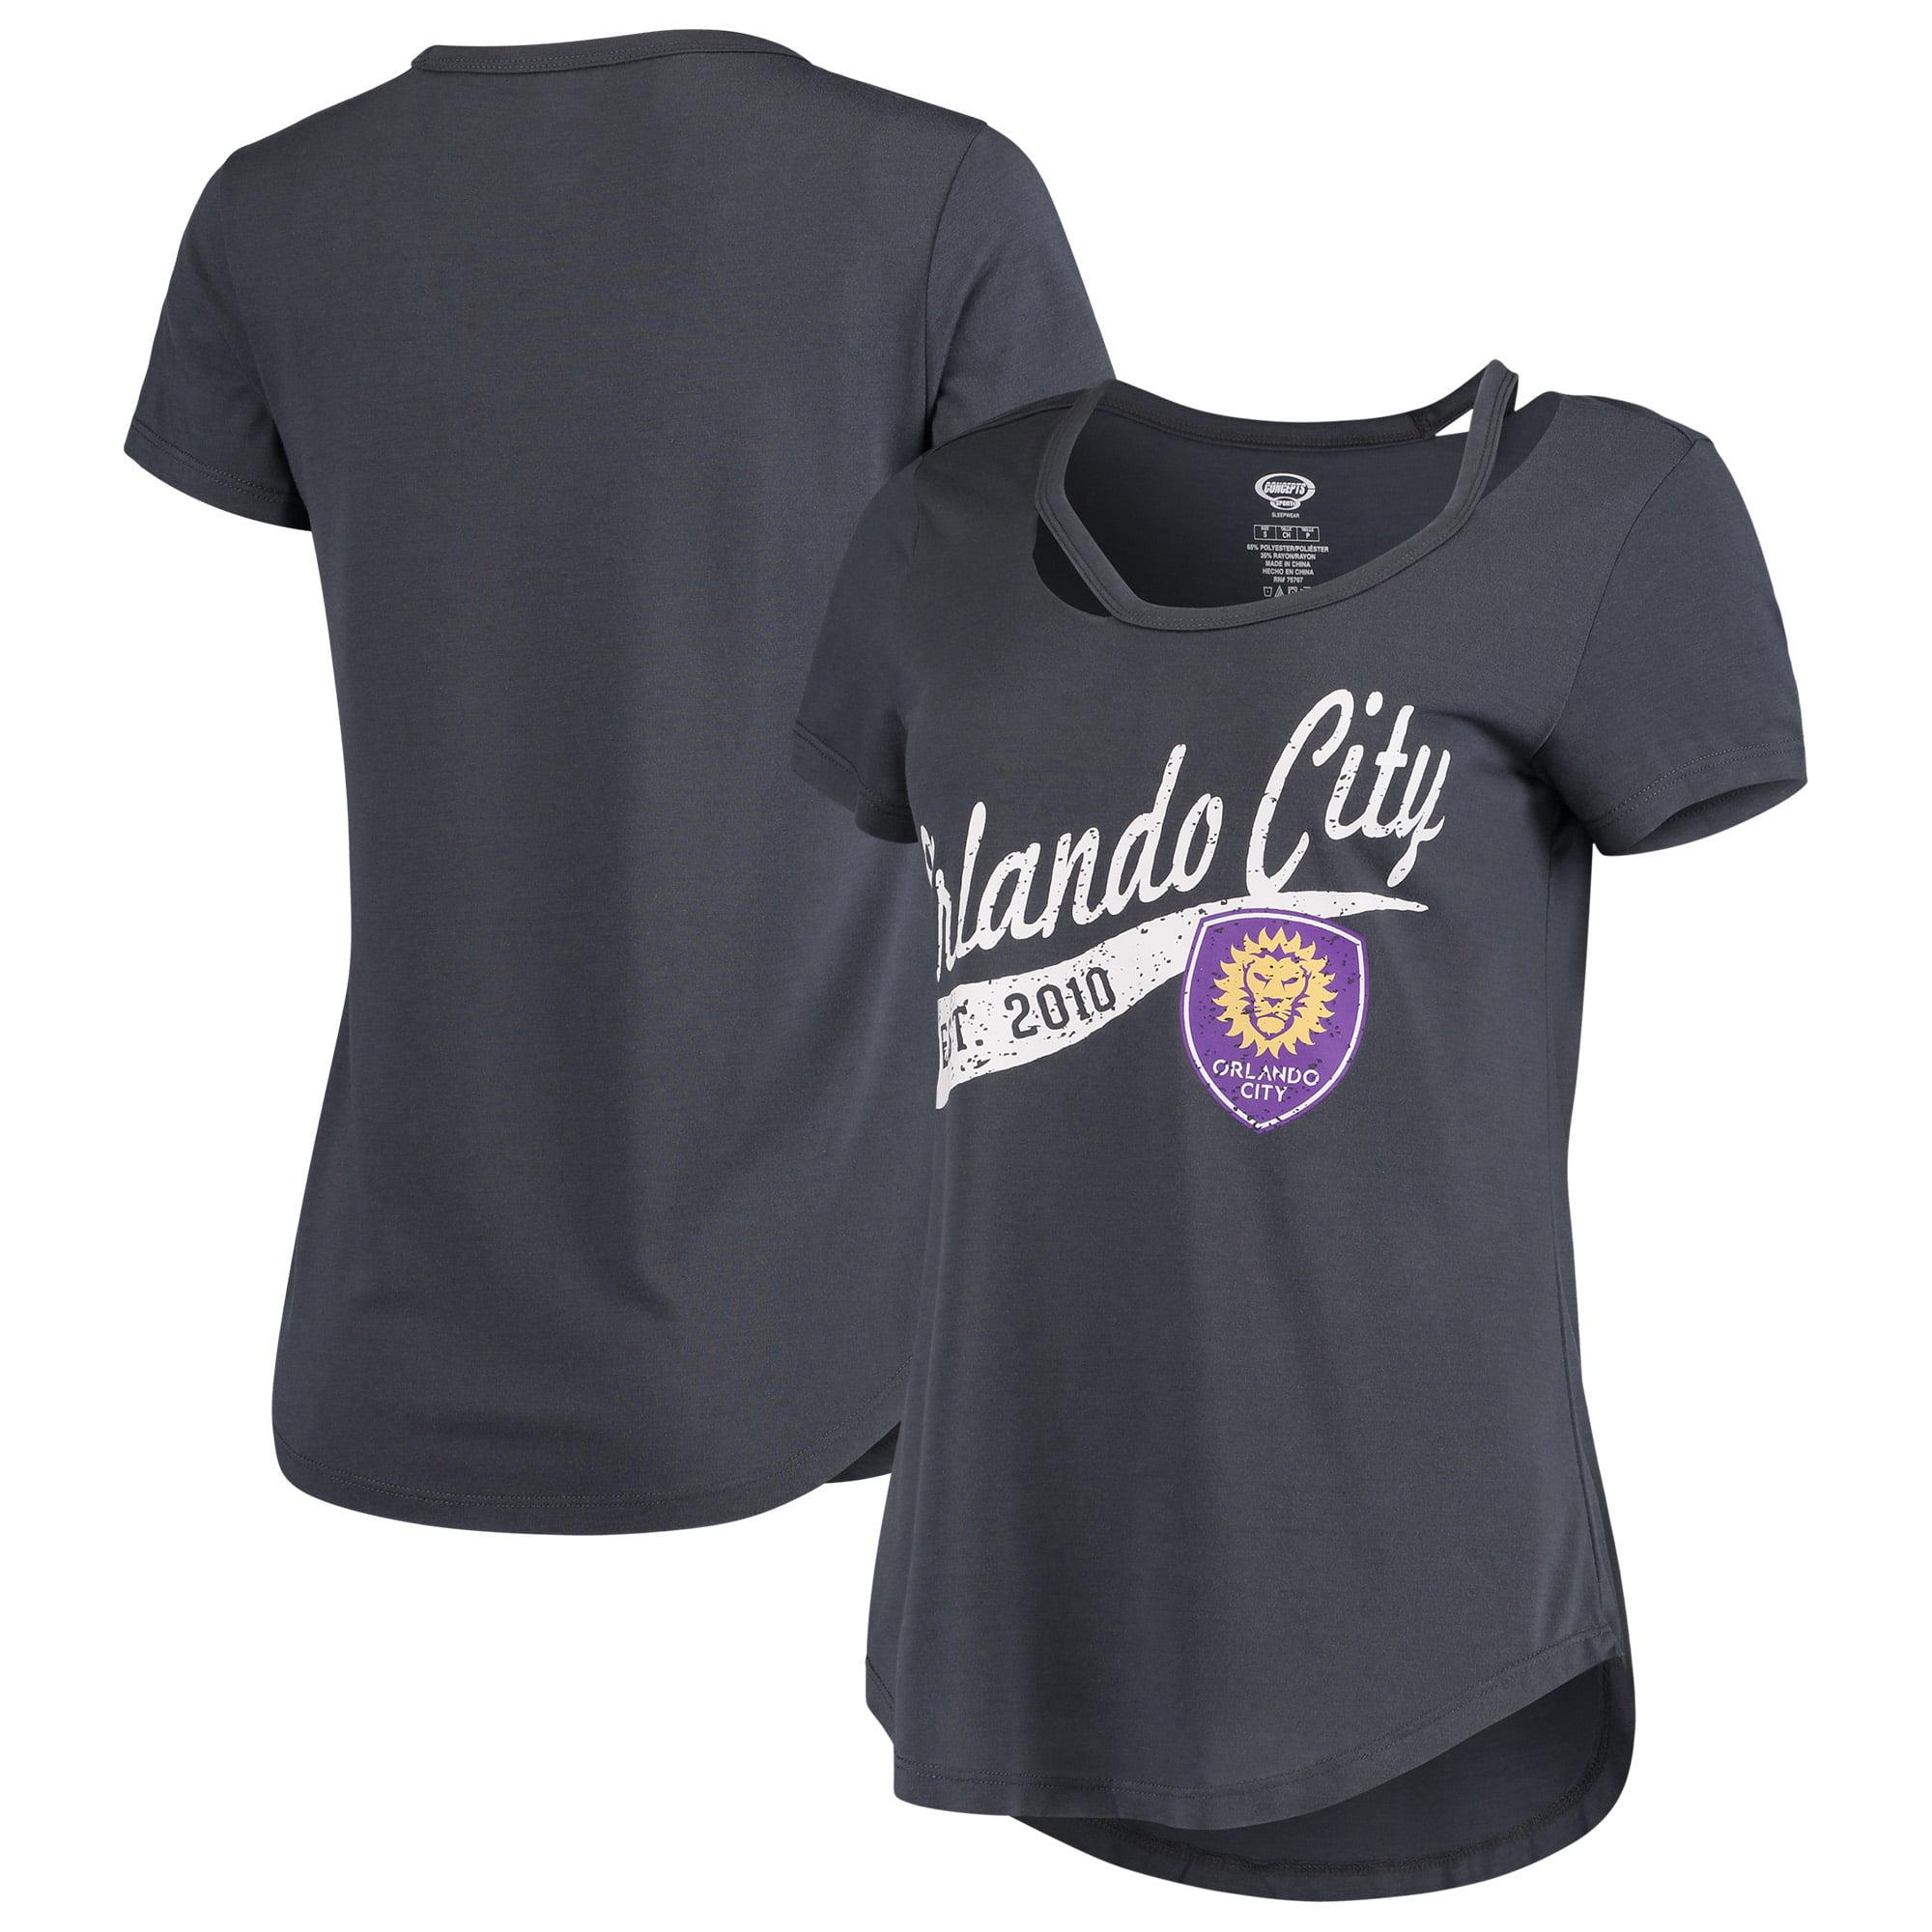 Orlando City SC Concepts Sport Women's Squad Cut Neck T-Shirt - Charcoal